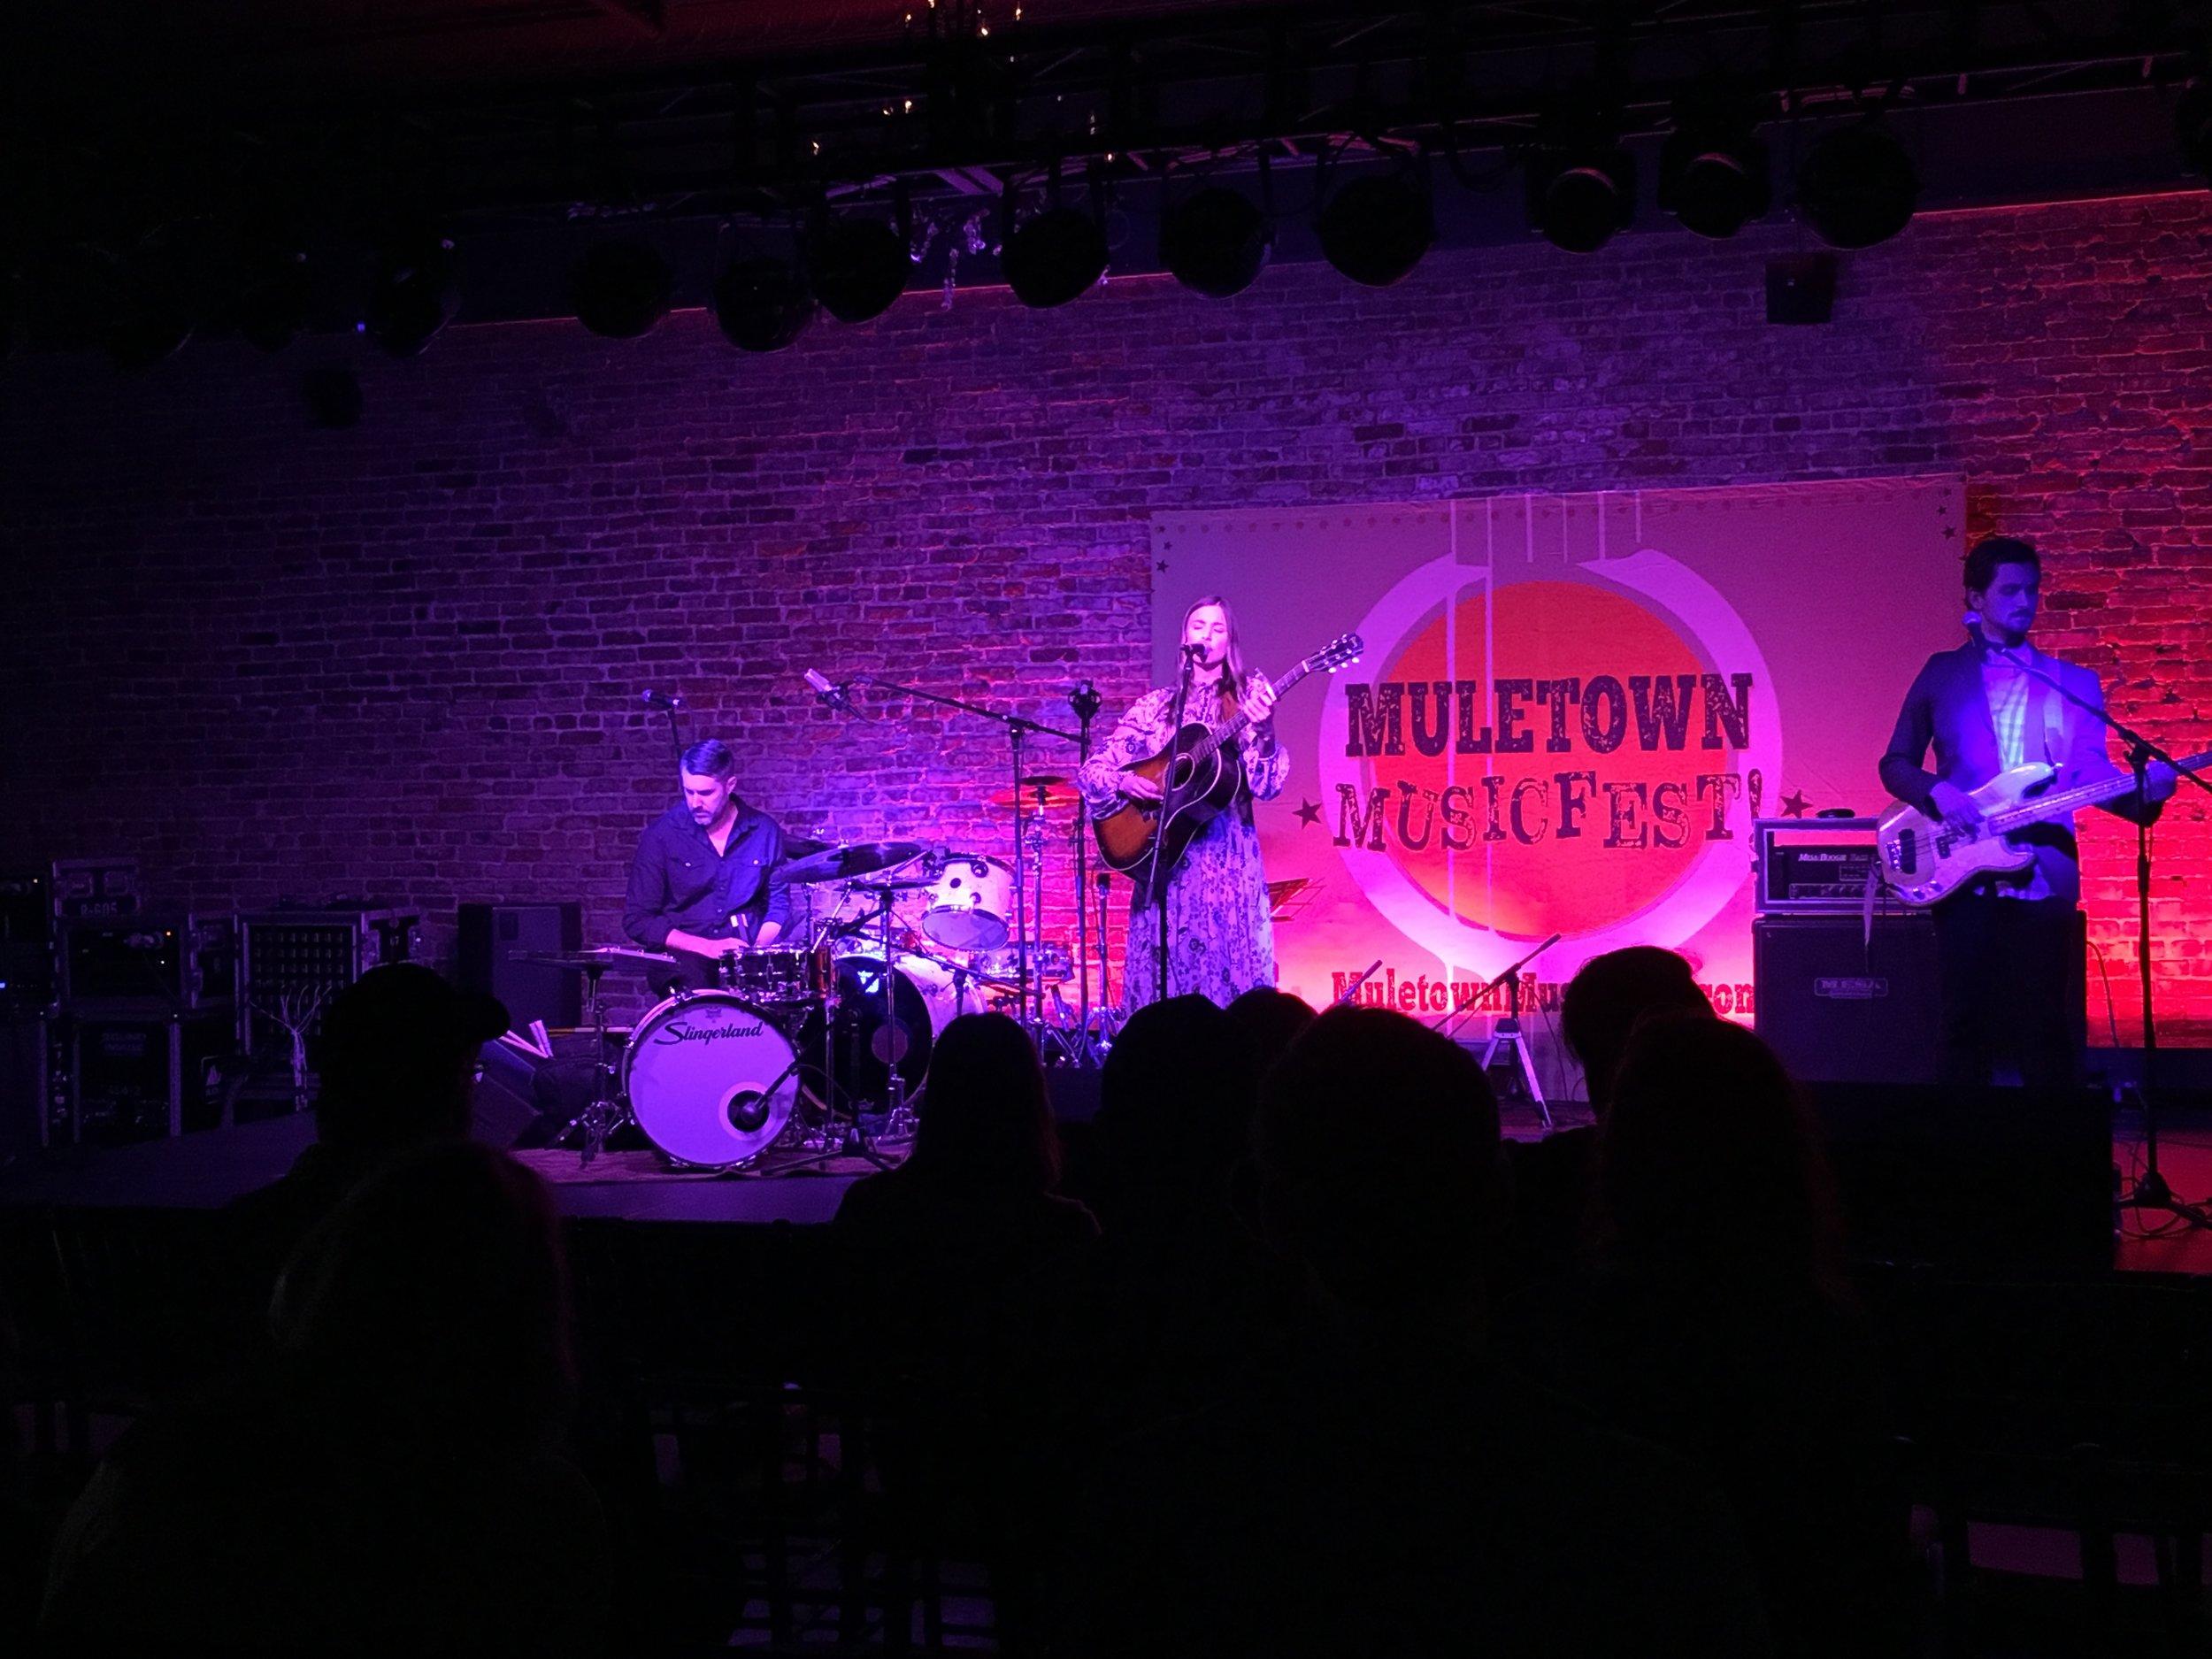 Jill Andrews performing at Muletown Music Fest in Columbia, TN